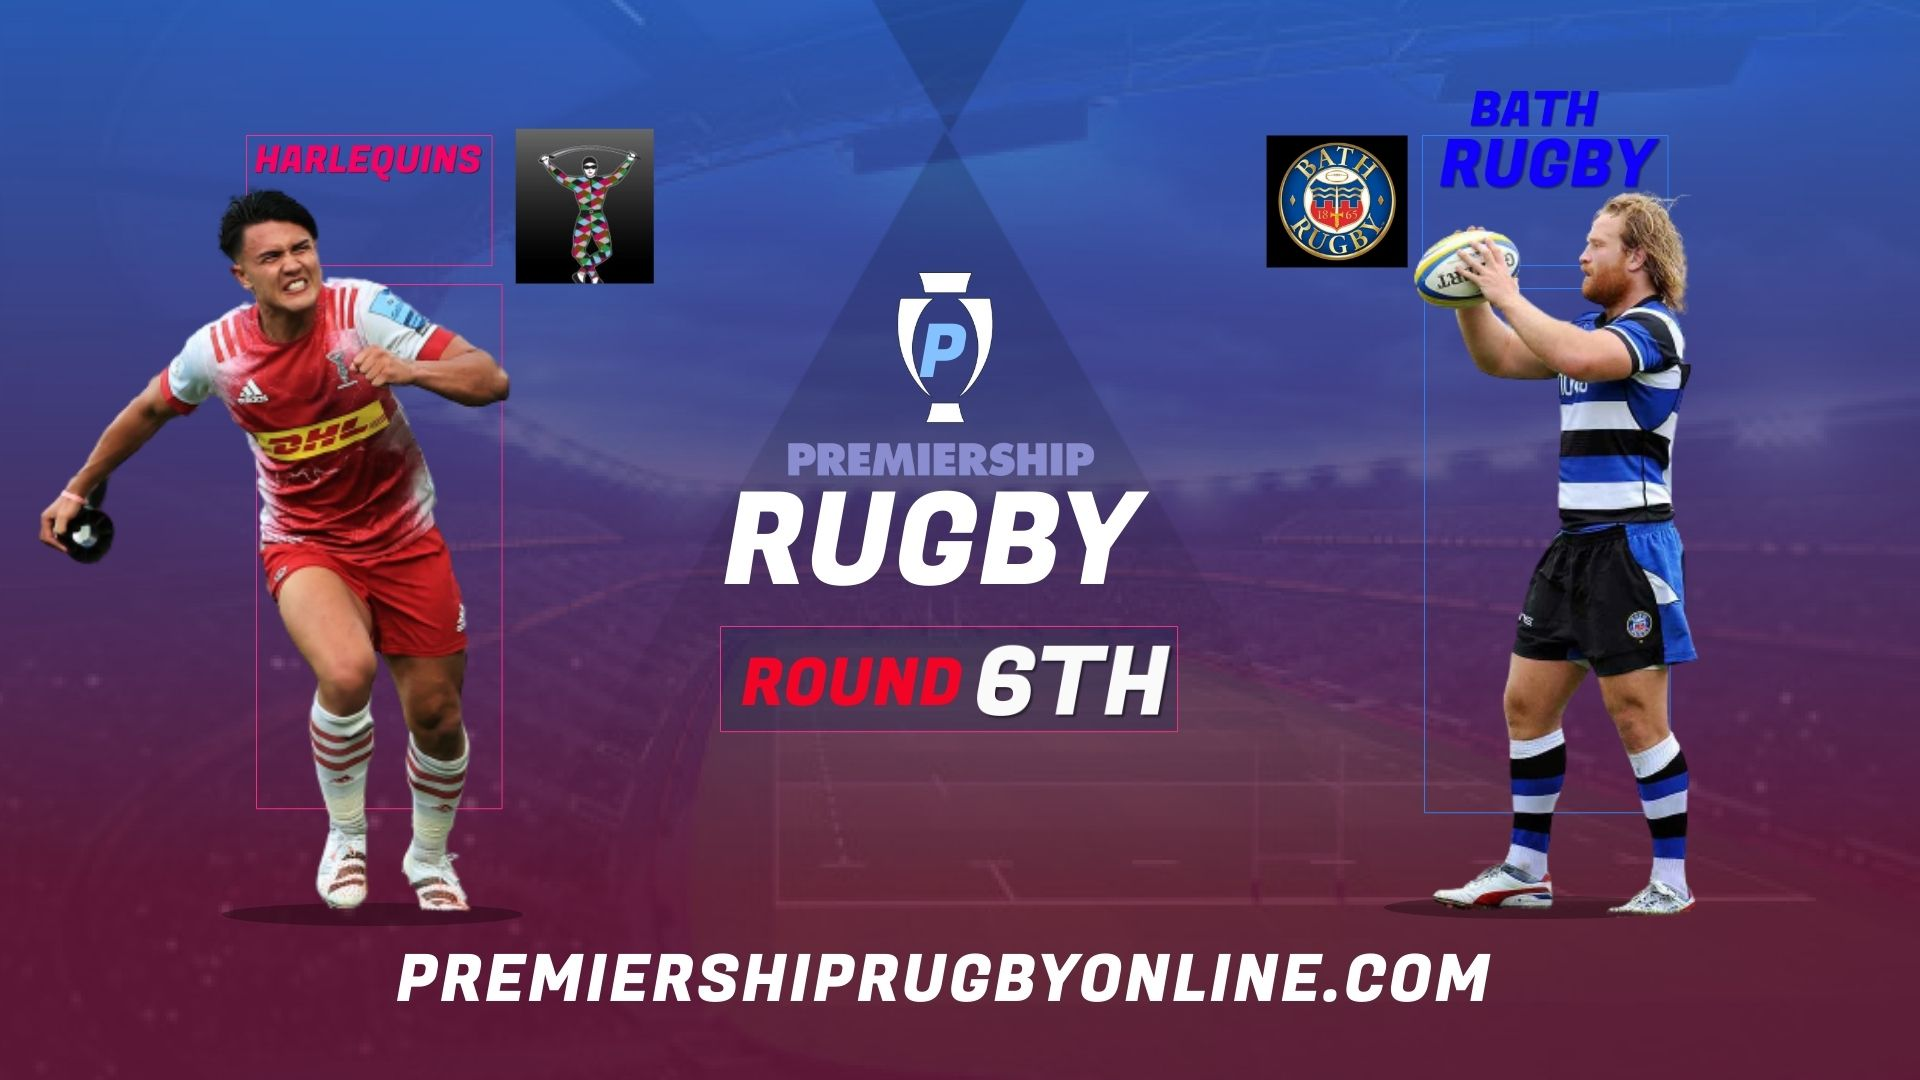 Harlequins Vs Bath Rugby Live Stream 2021-22 | Premiership Rugby Round 6